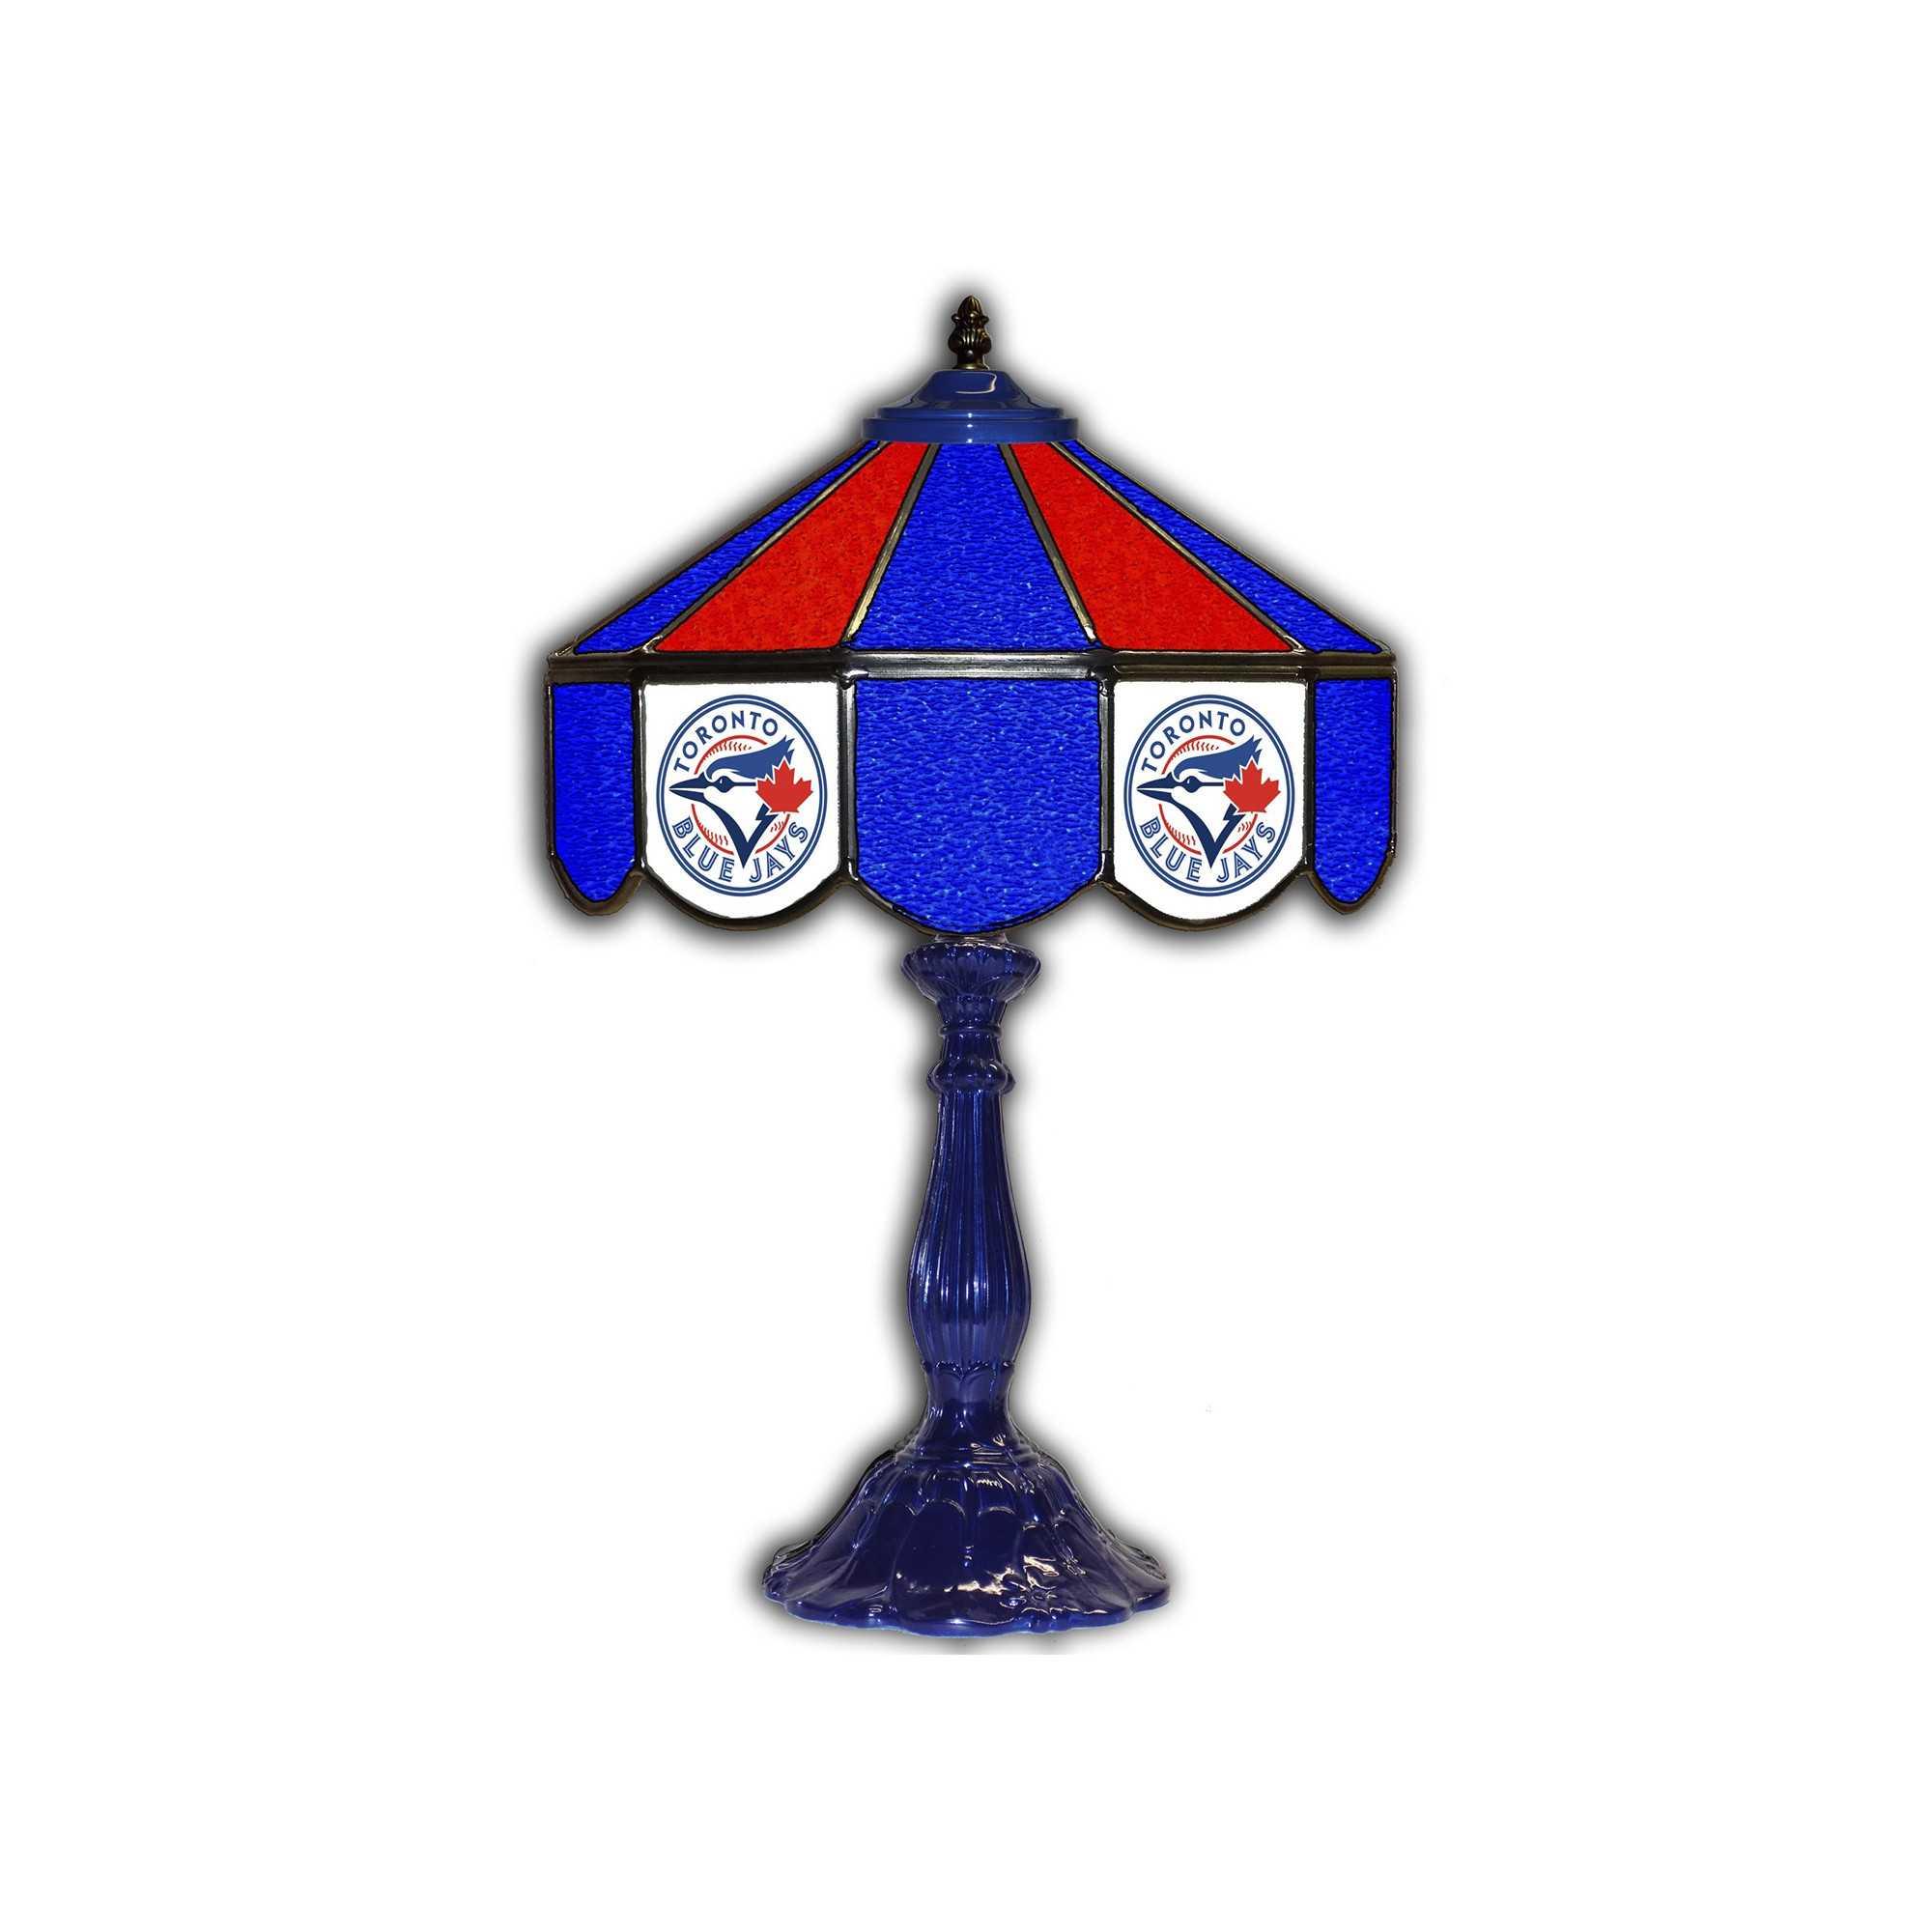 "TORONTO BLUE JAYS 21"" GLASS TABLE LAMP"